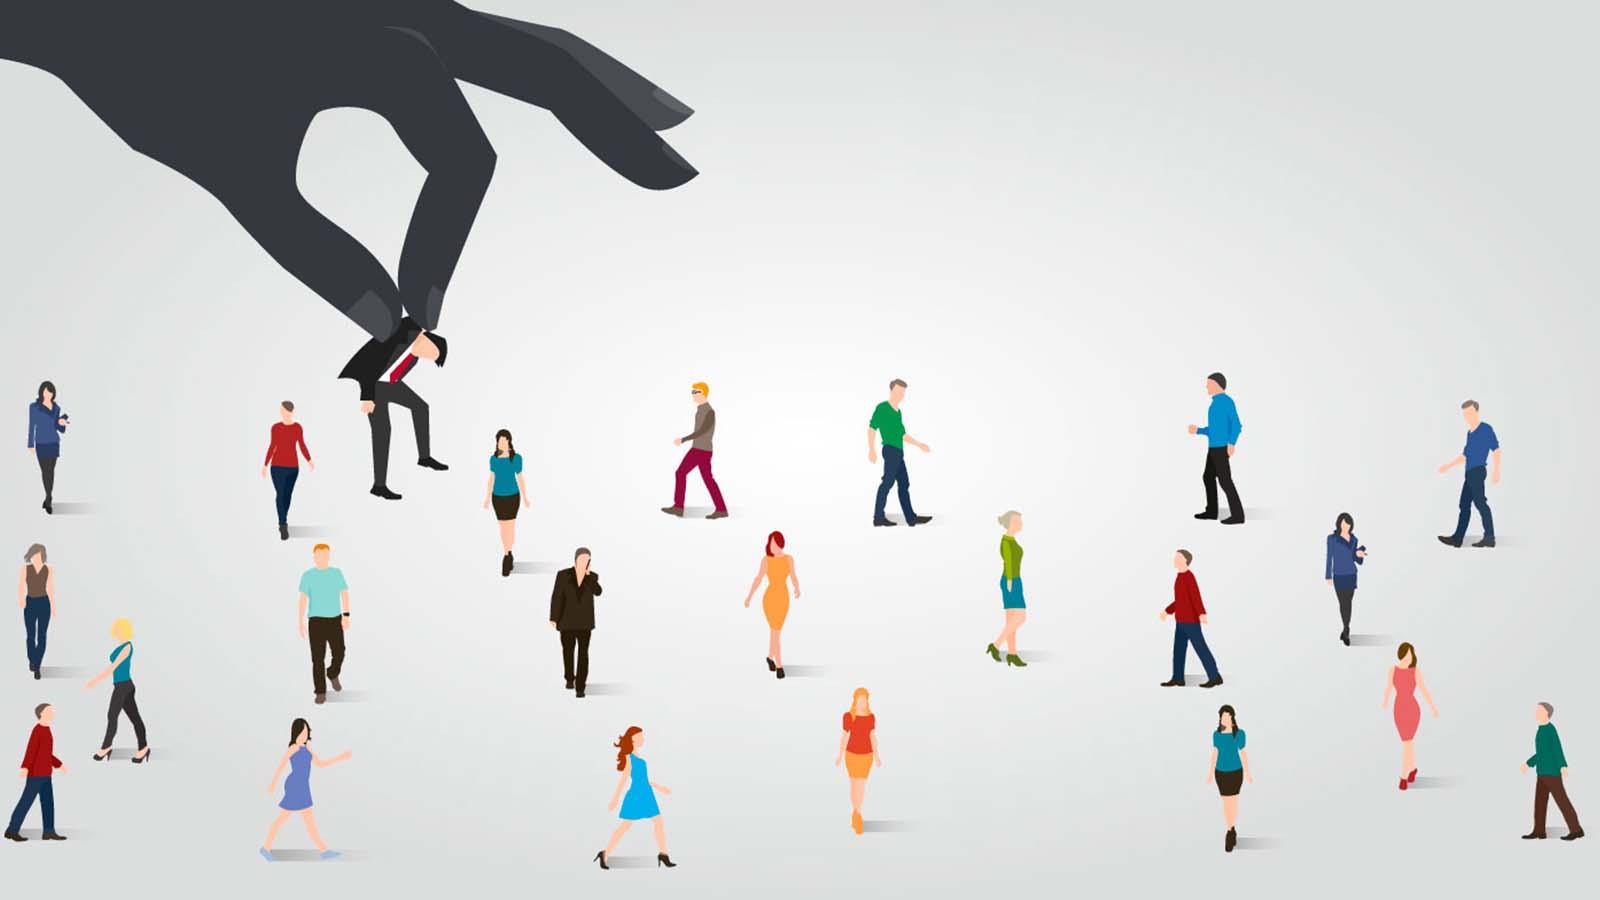 job title and linkedin profile